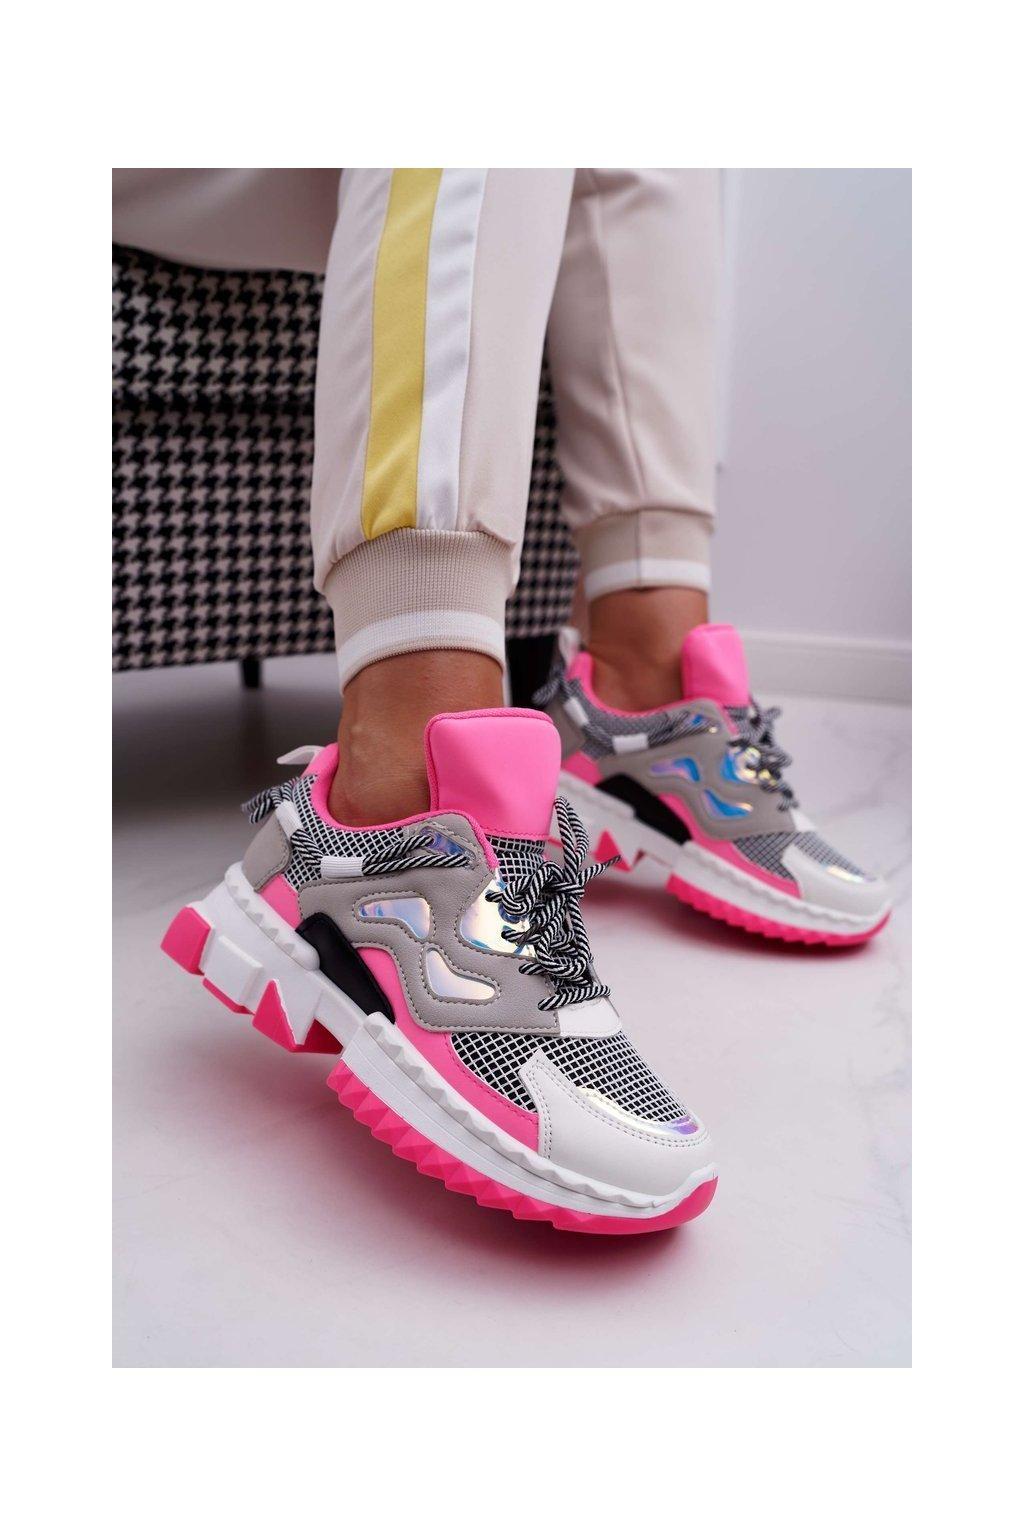 Dámska športová obuv, Barevné části Fuchsie Colored